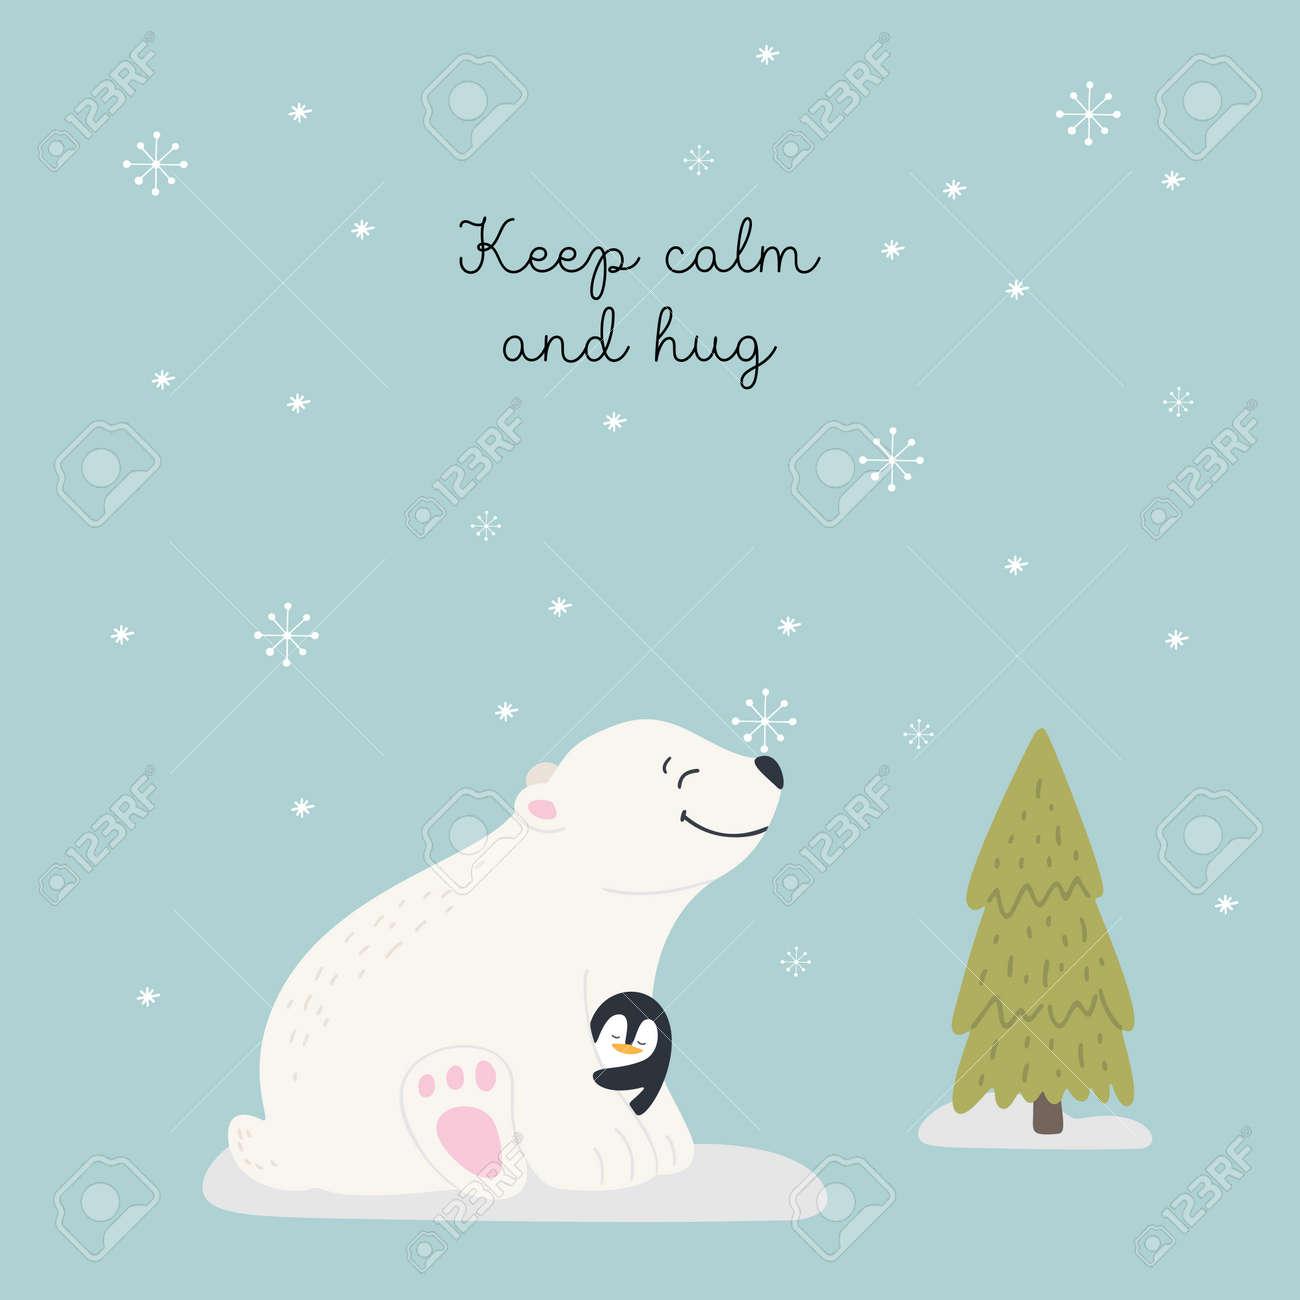 Christmas card with animals, hand drawn style. Polar bear and penguin hugsl. Vector illustration. - 132535733